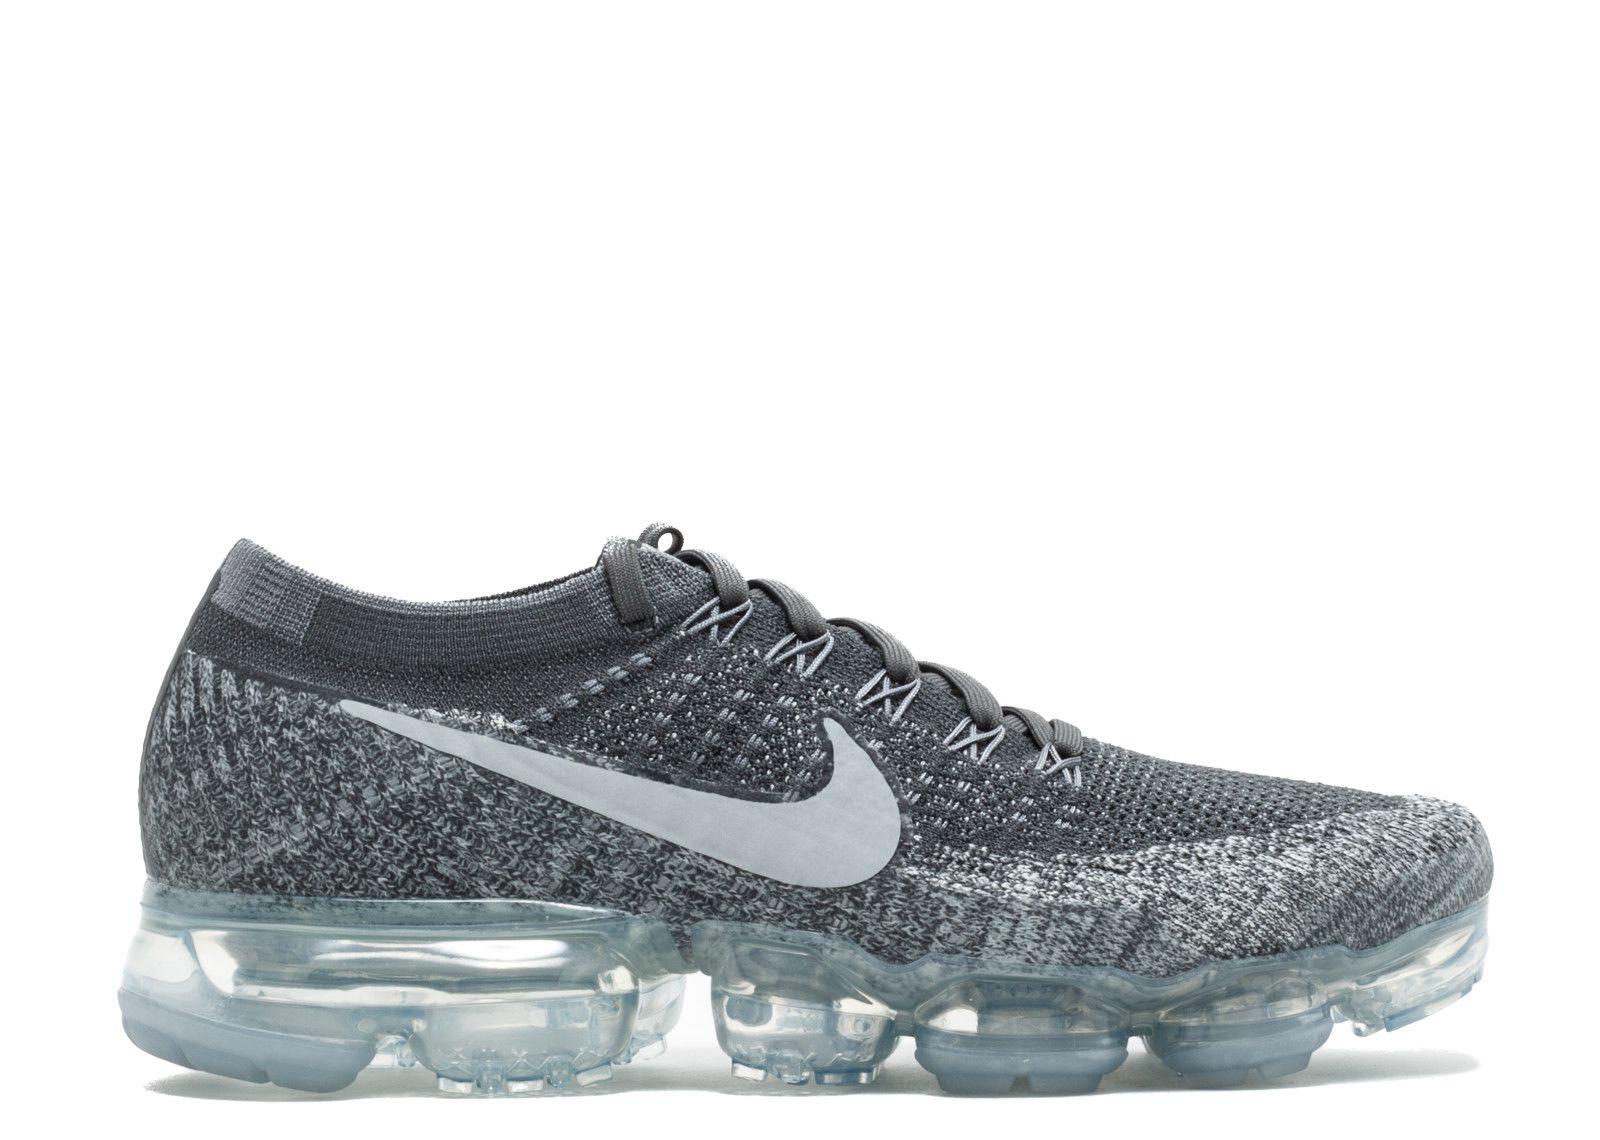 Nike Womens Running Shoes Gray